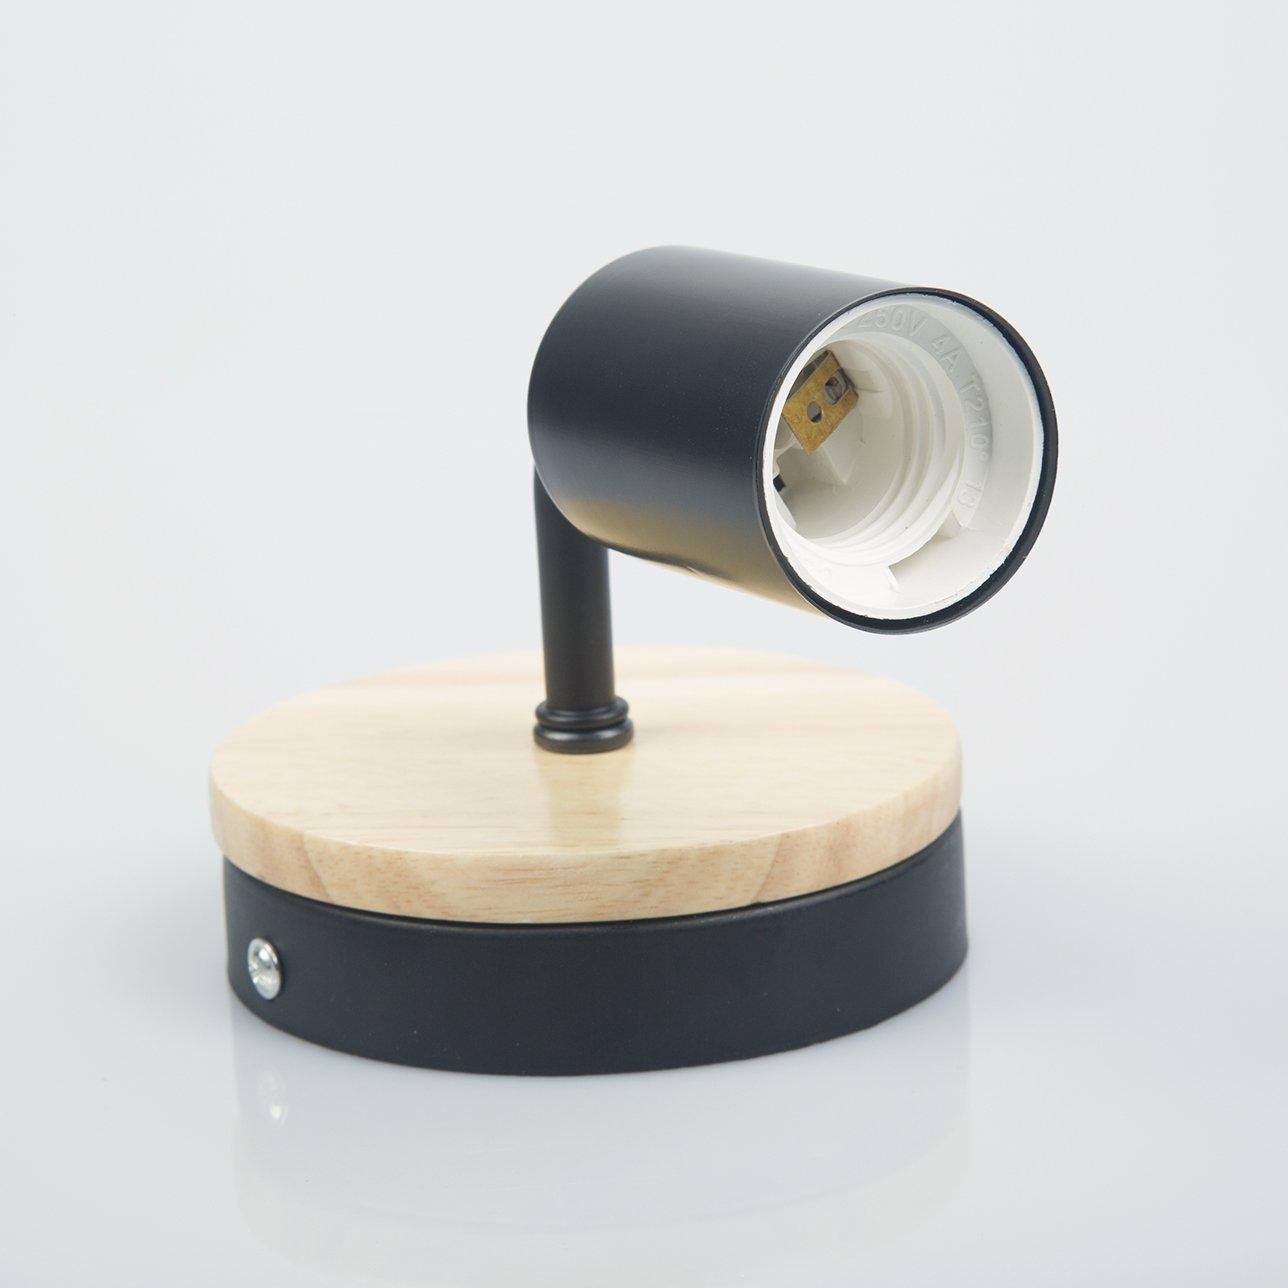 blanco OYGROUP Moderno creativo de madera Vintage l/ámpara de pared de hierro forjado E27 40W de montaje en pared l/ámpara de cabecera de luz de lectura para dormitorio Sal/ón